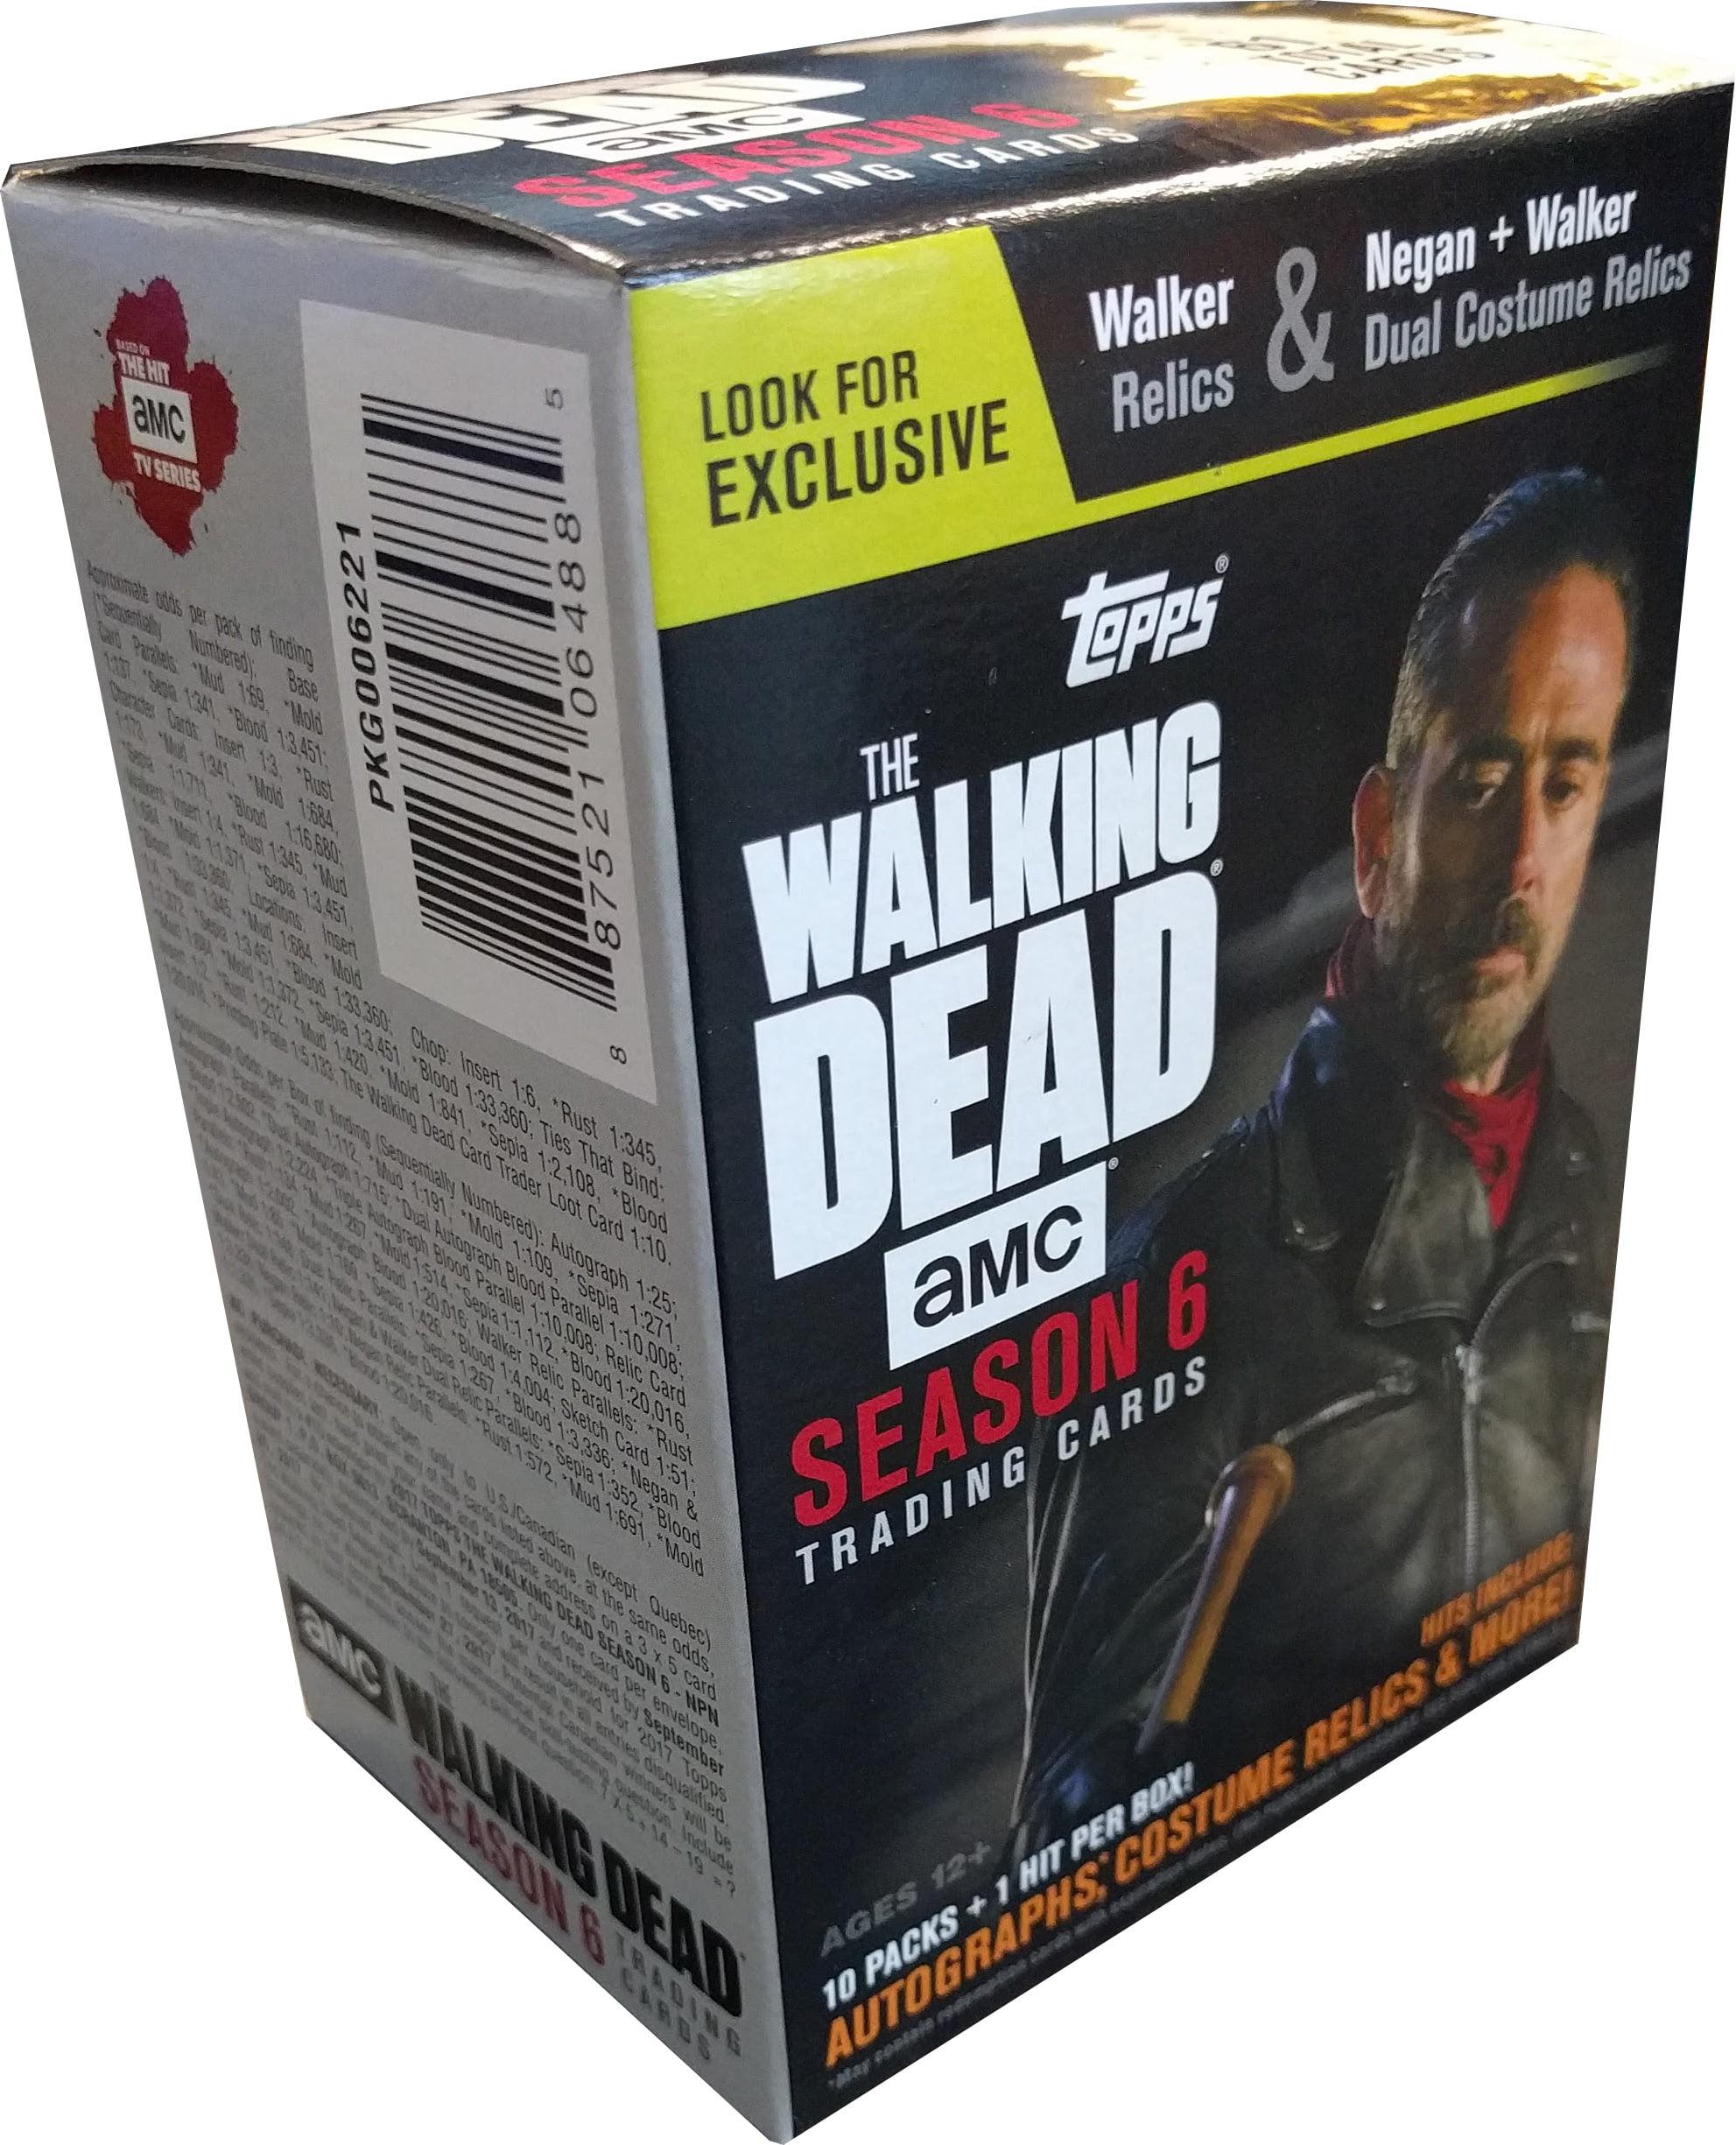 Walking Dead Season 6 Character Chase Card C-12 Rosita Espinosa